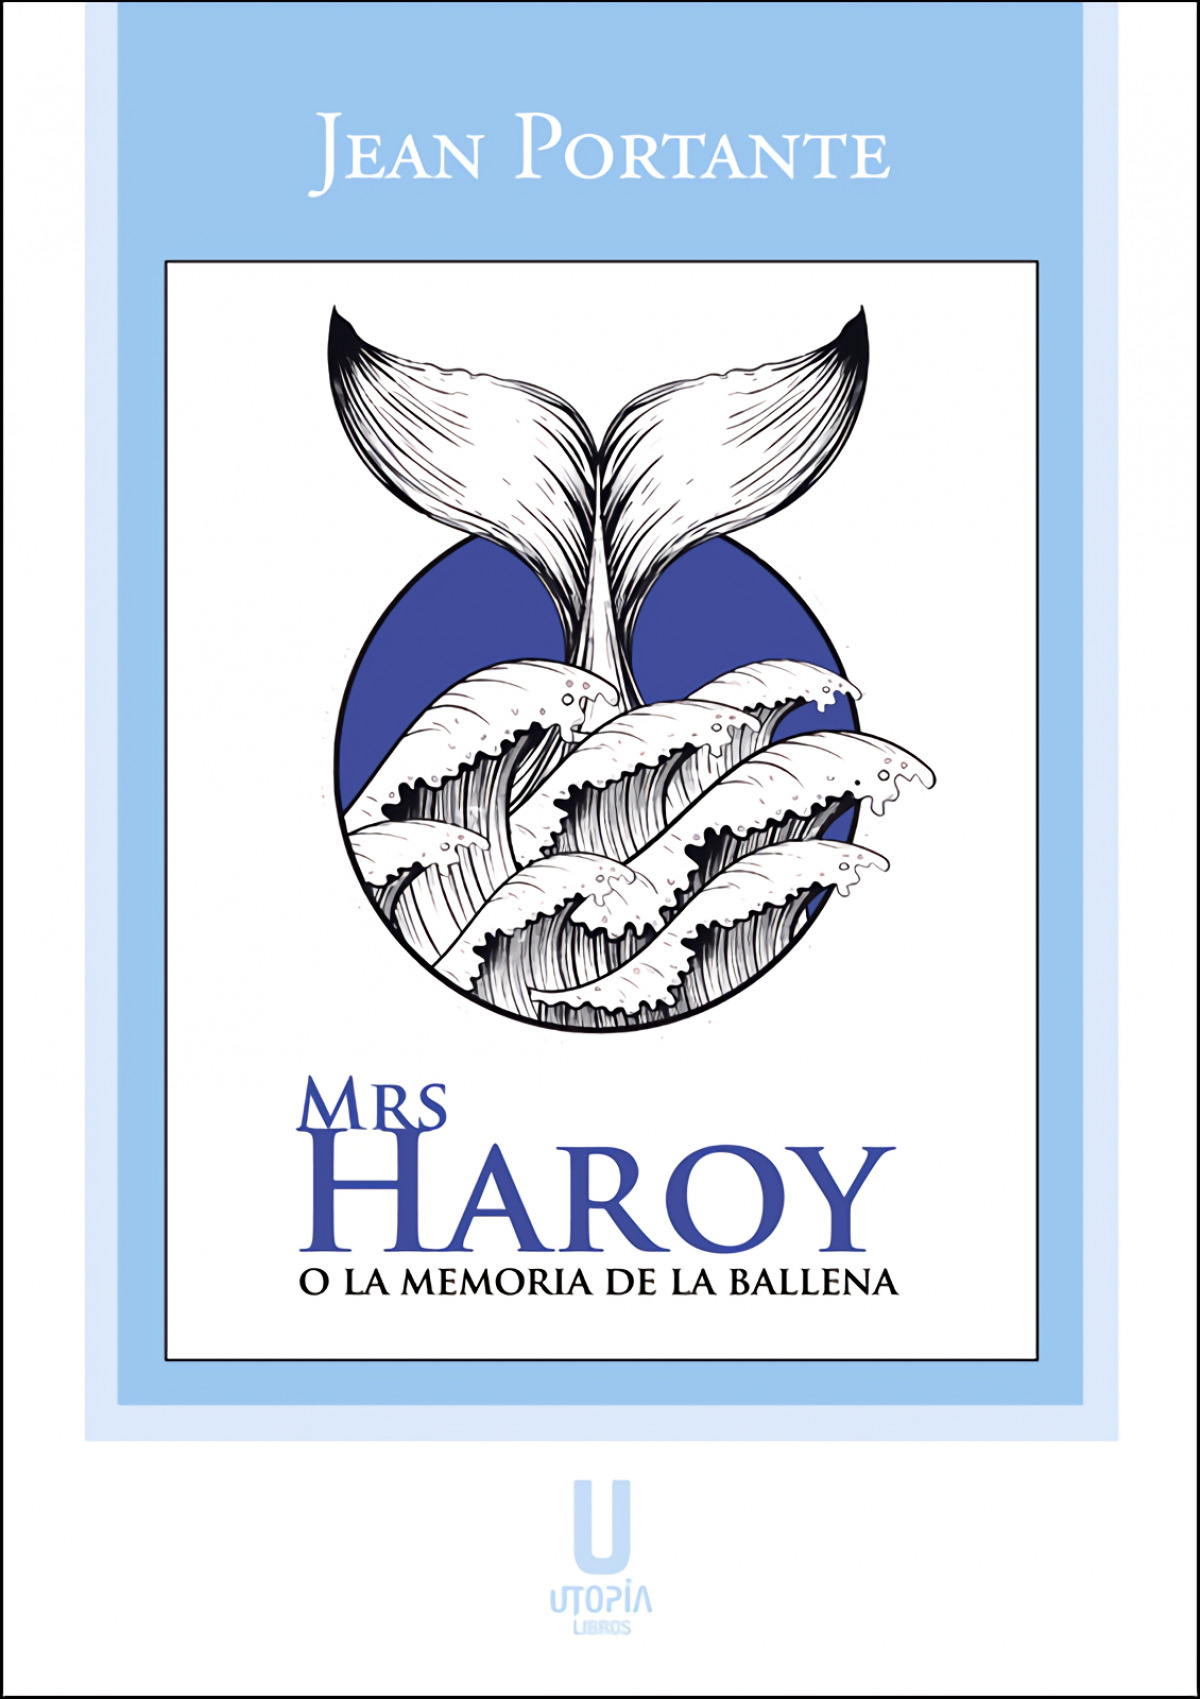 Mrs Haroy o la memoria de la ballena